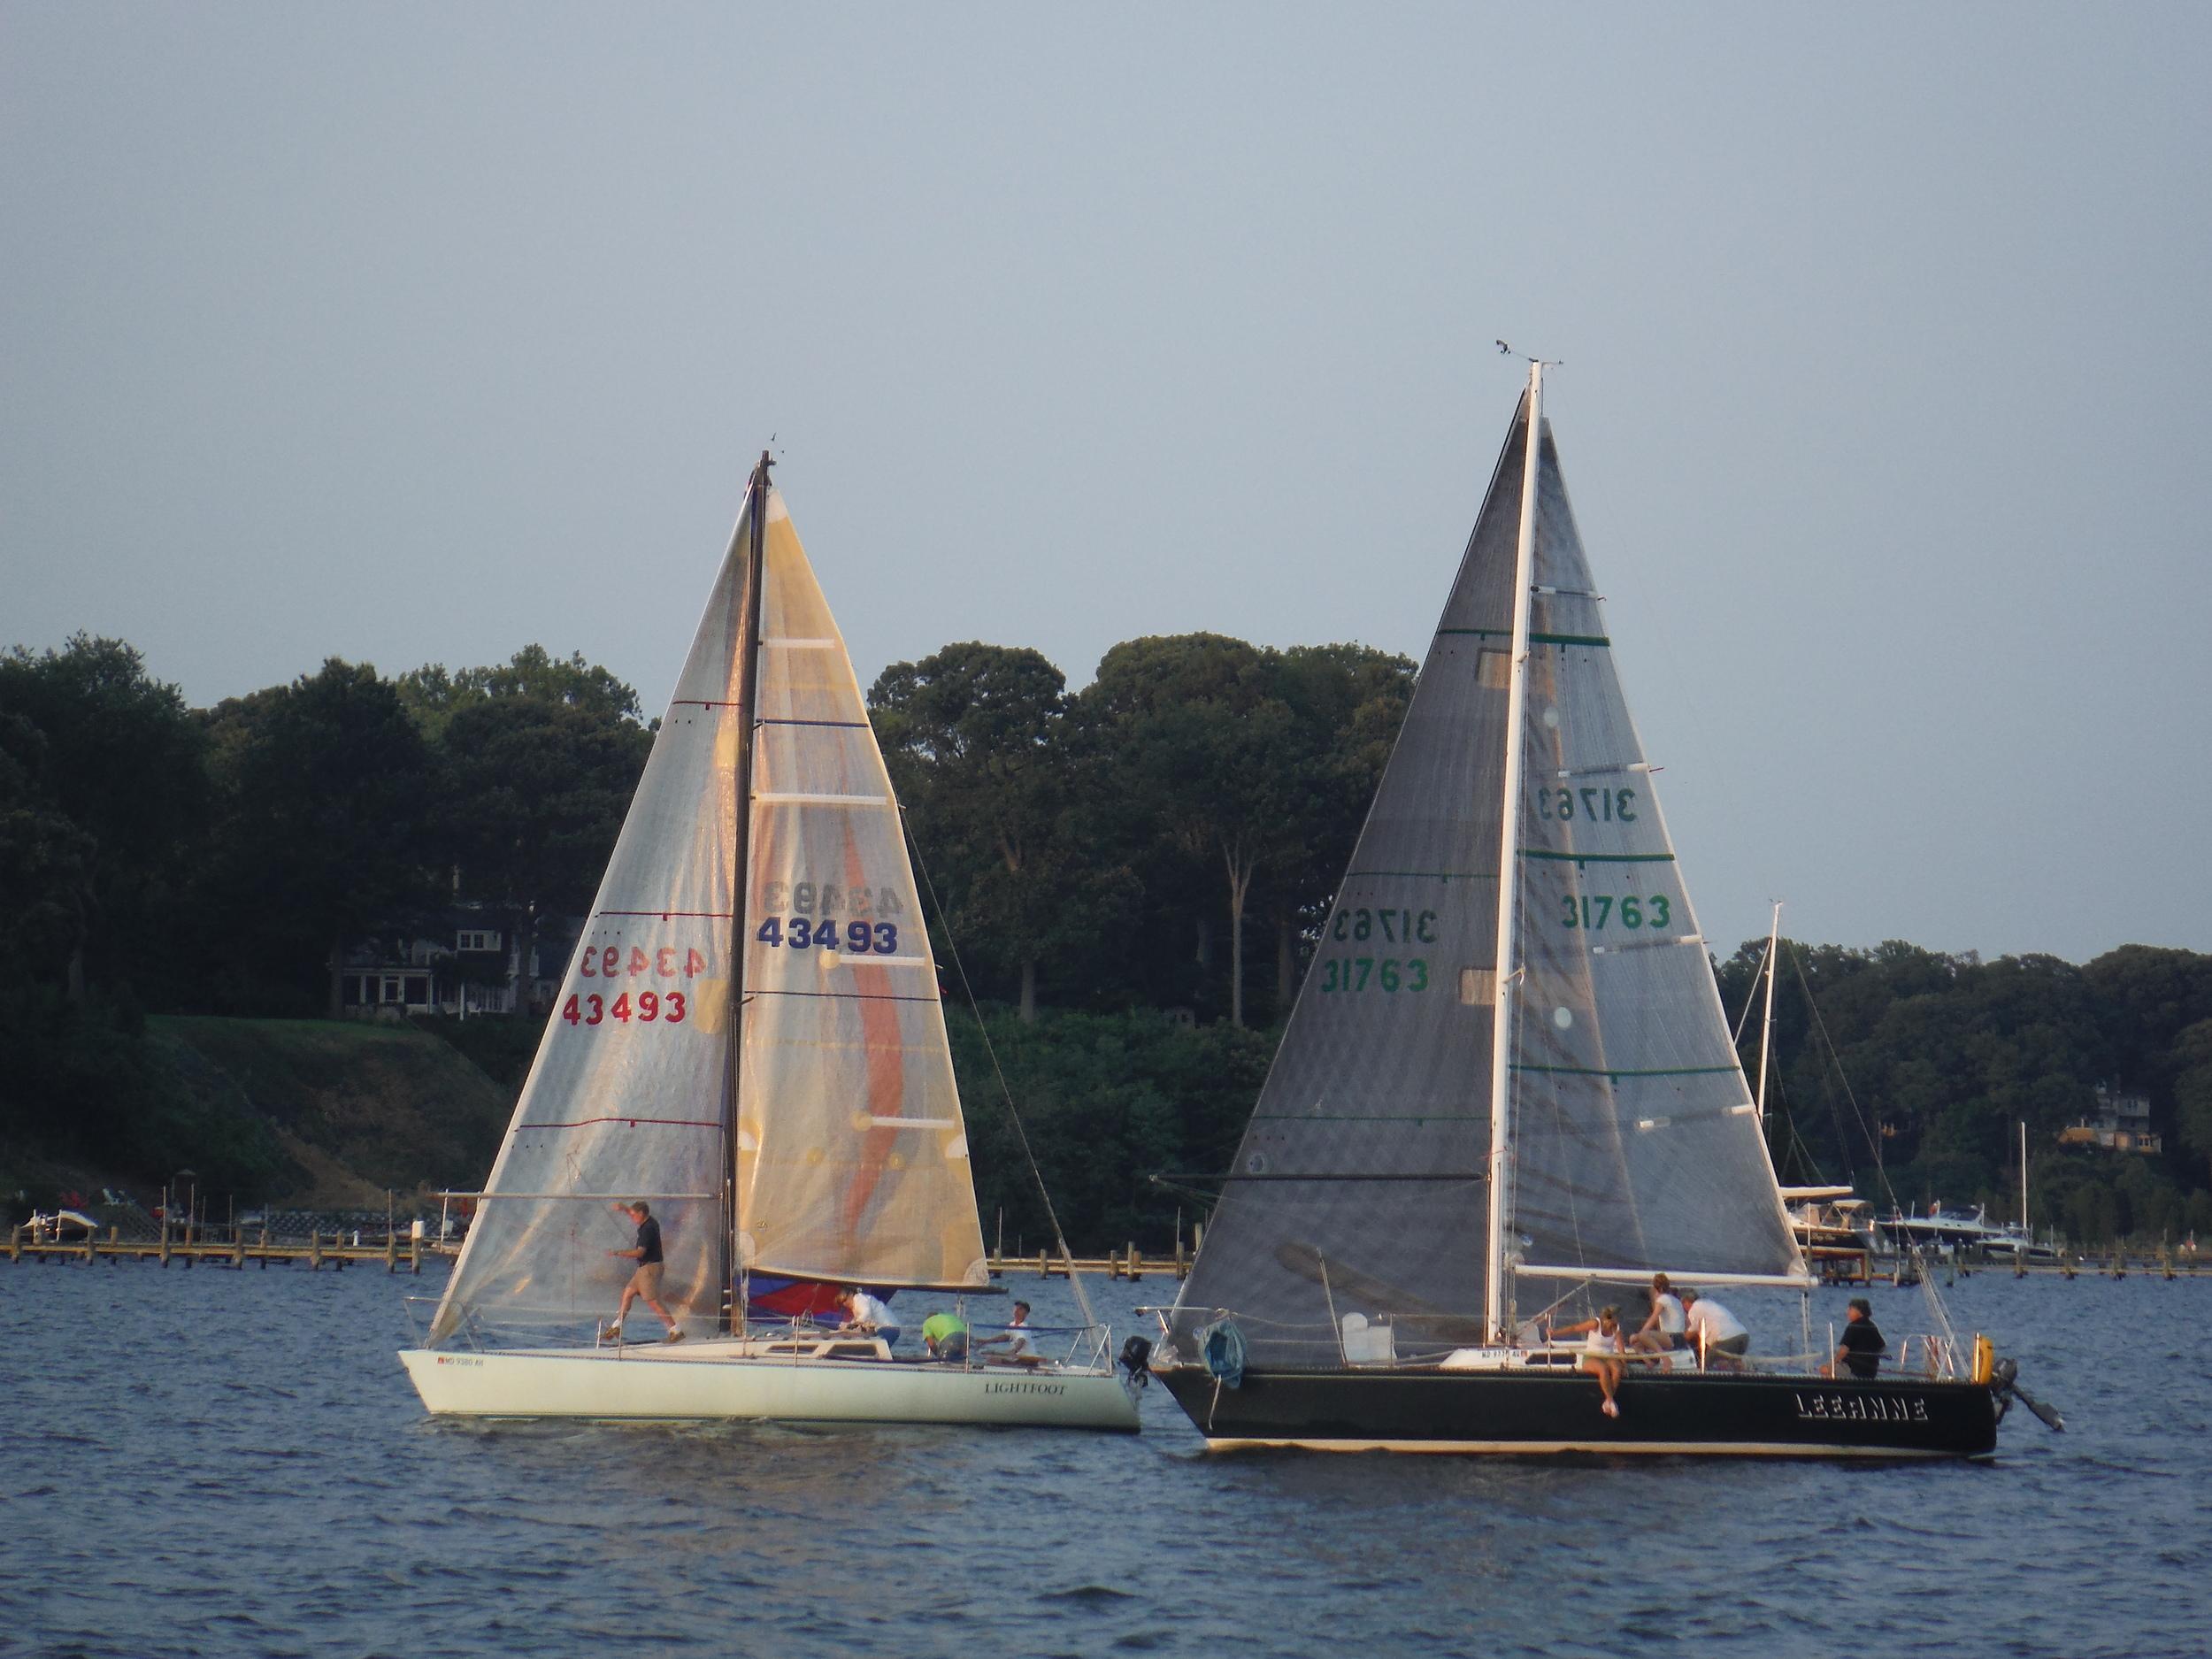 7-30-14 Race Commitee Photos 091.JPG